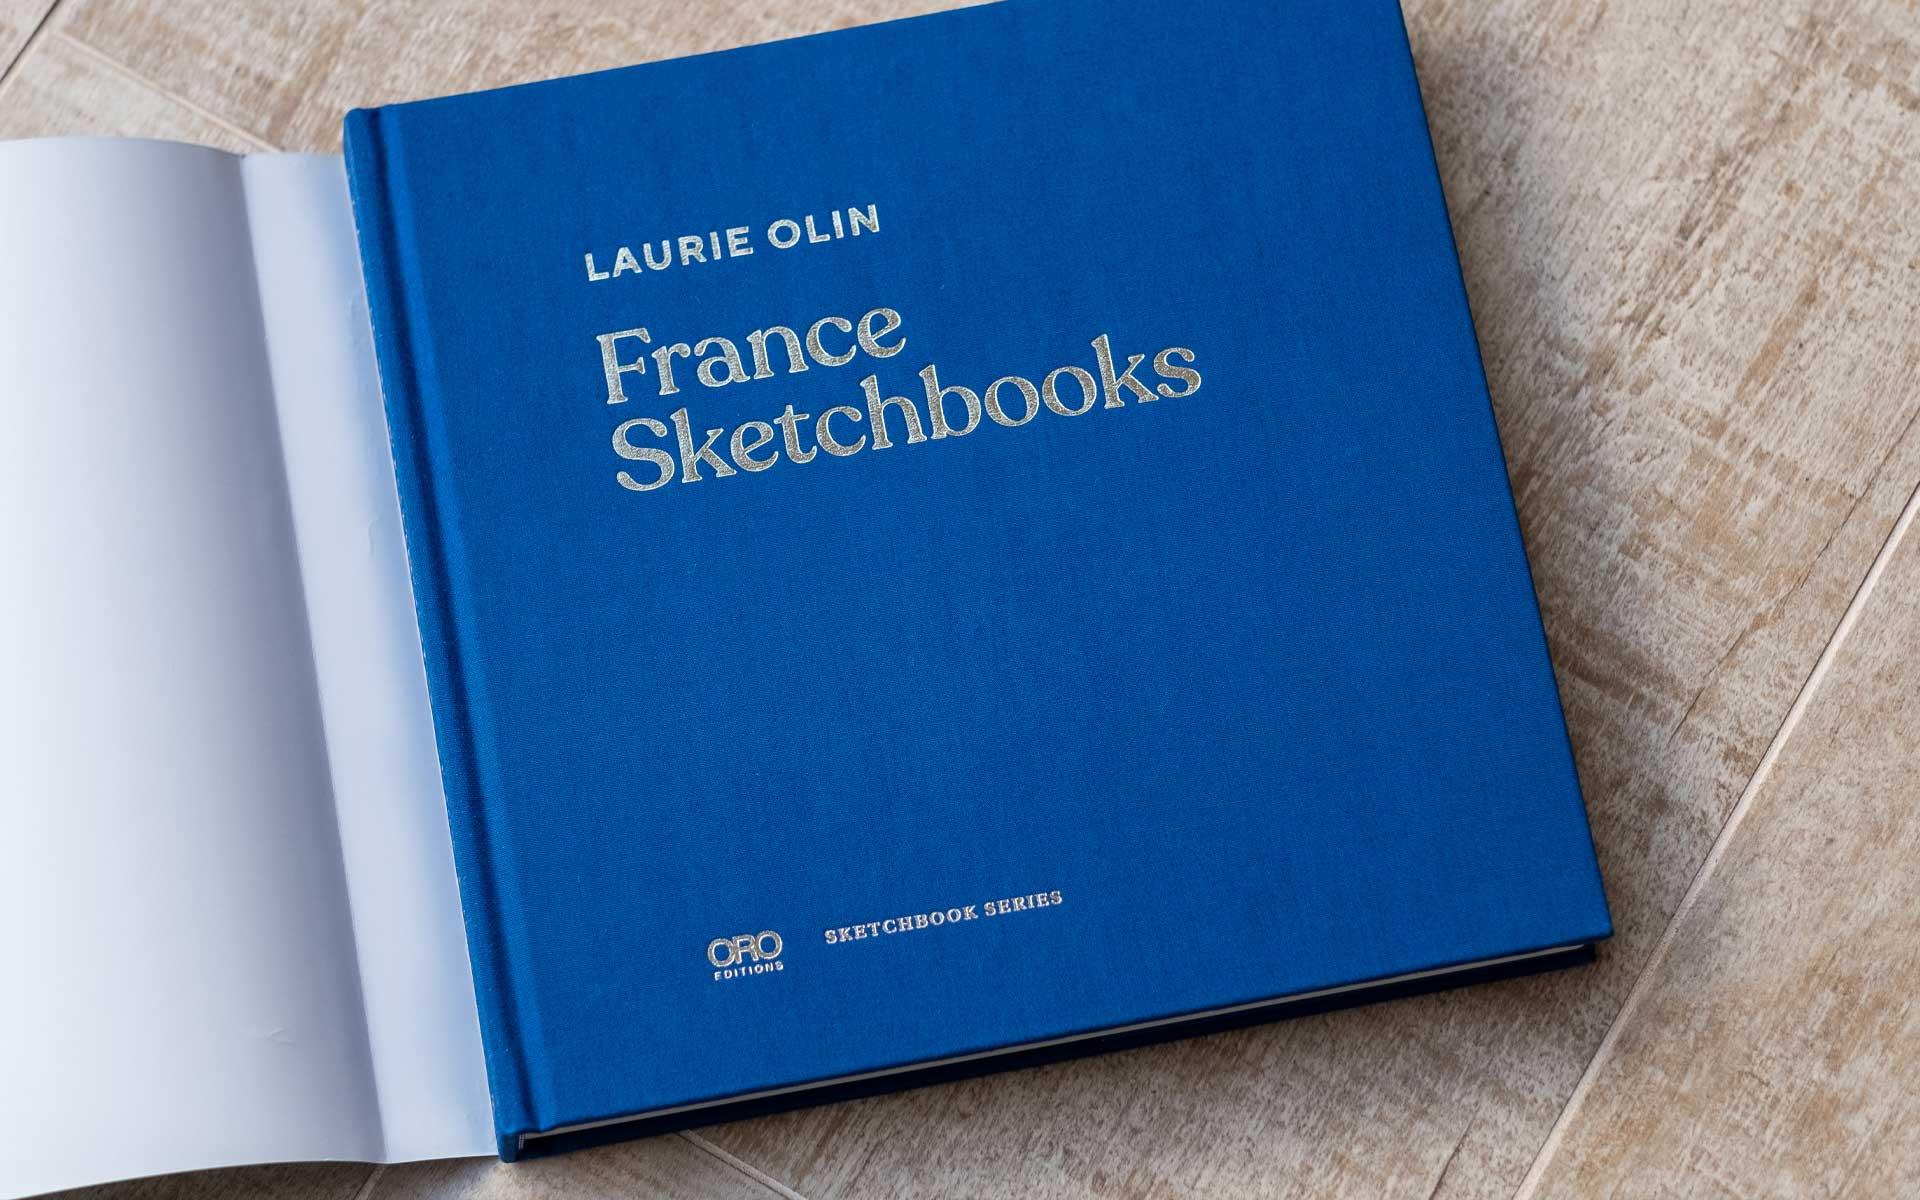 sketchbooks-laurie-olin-2